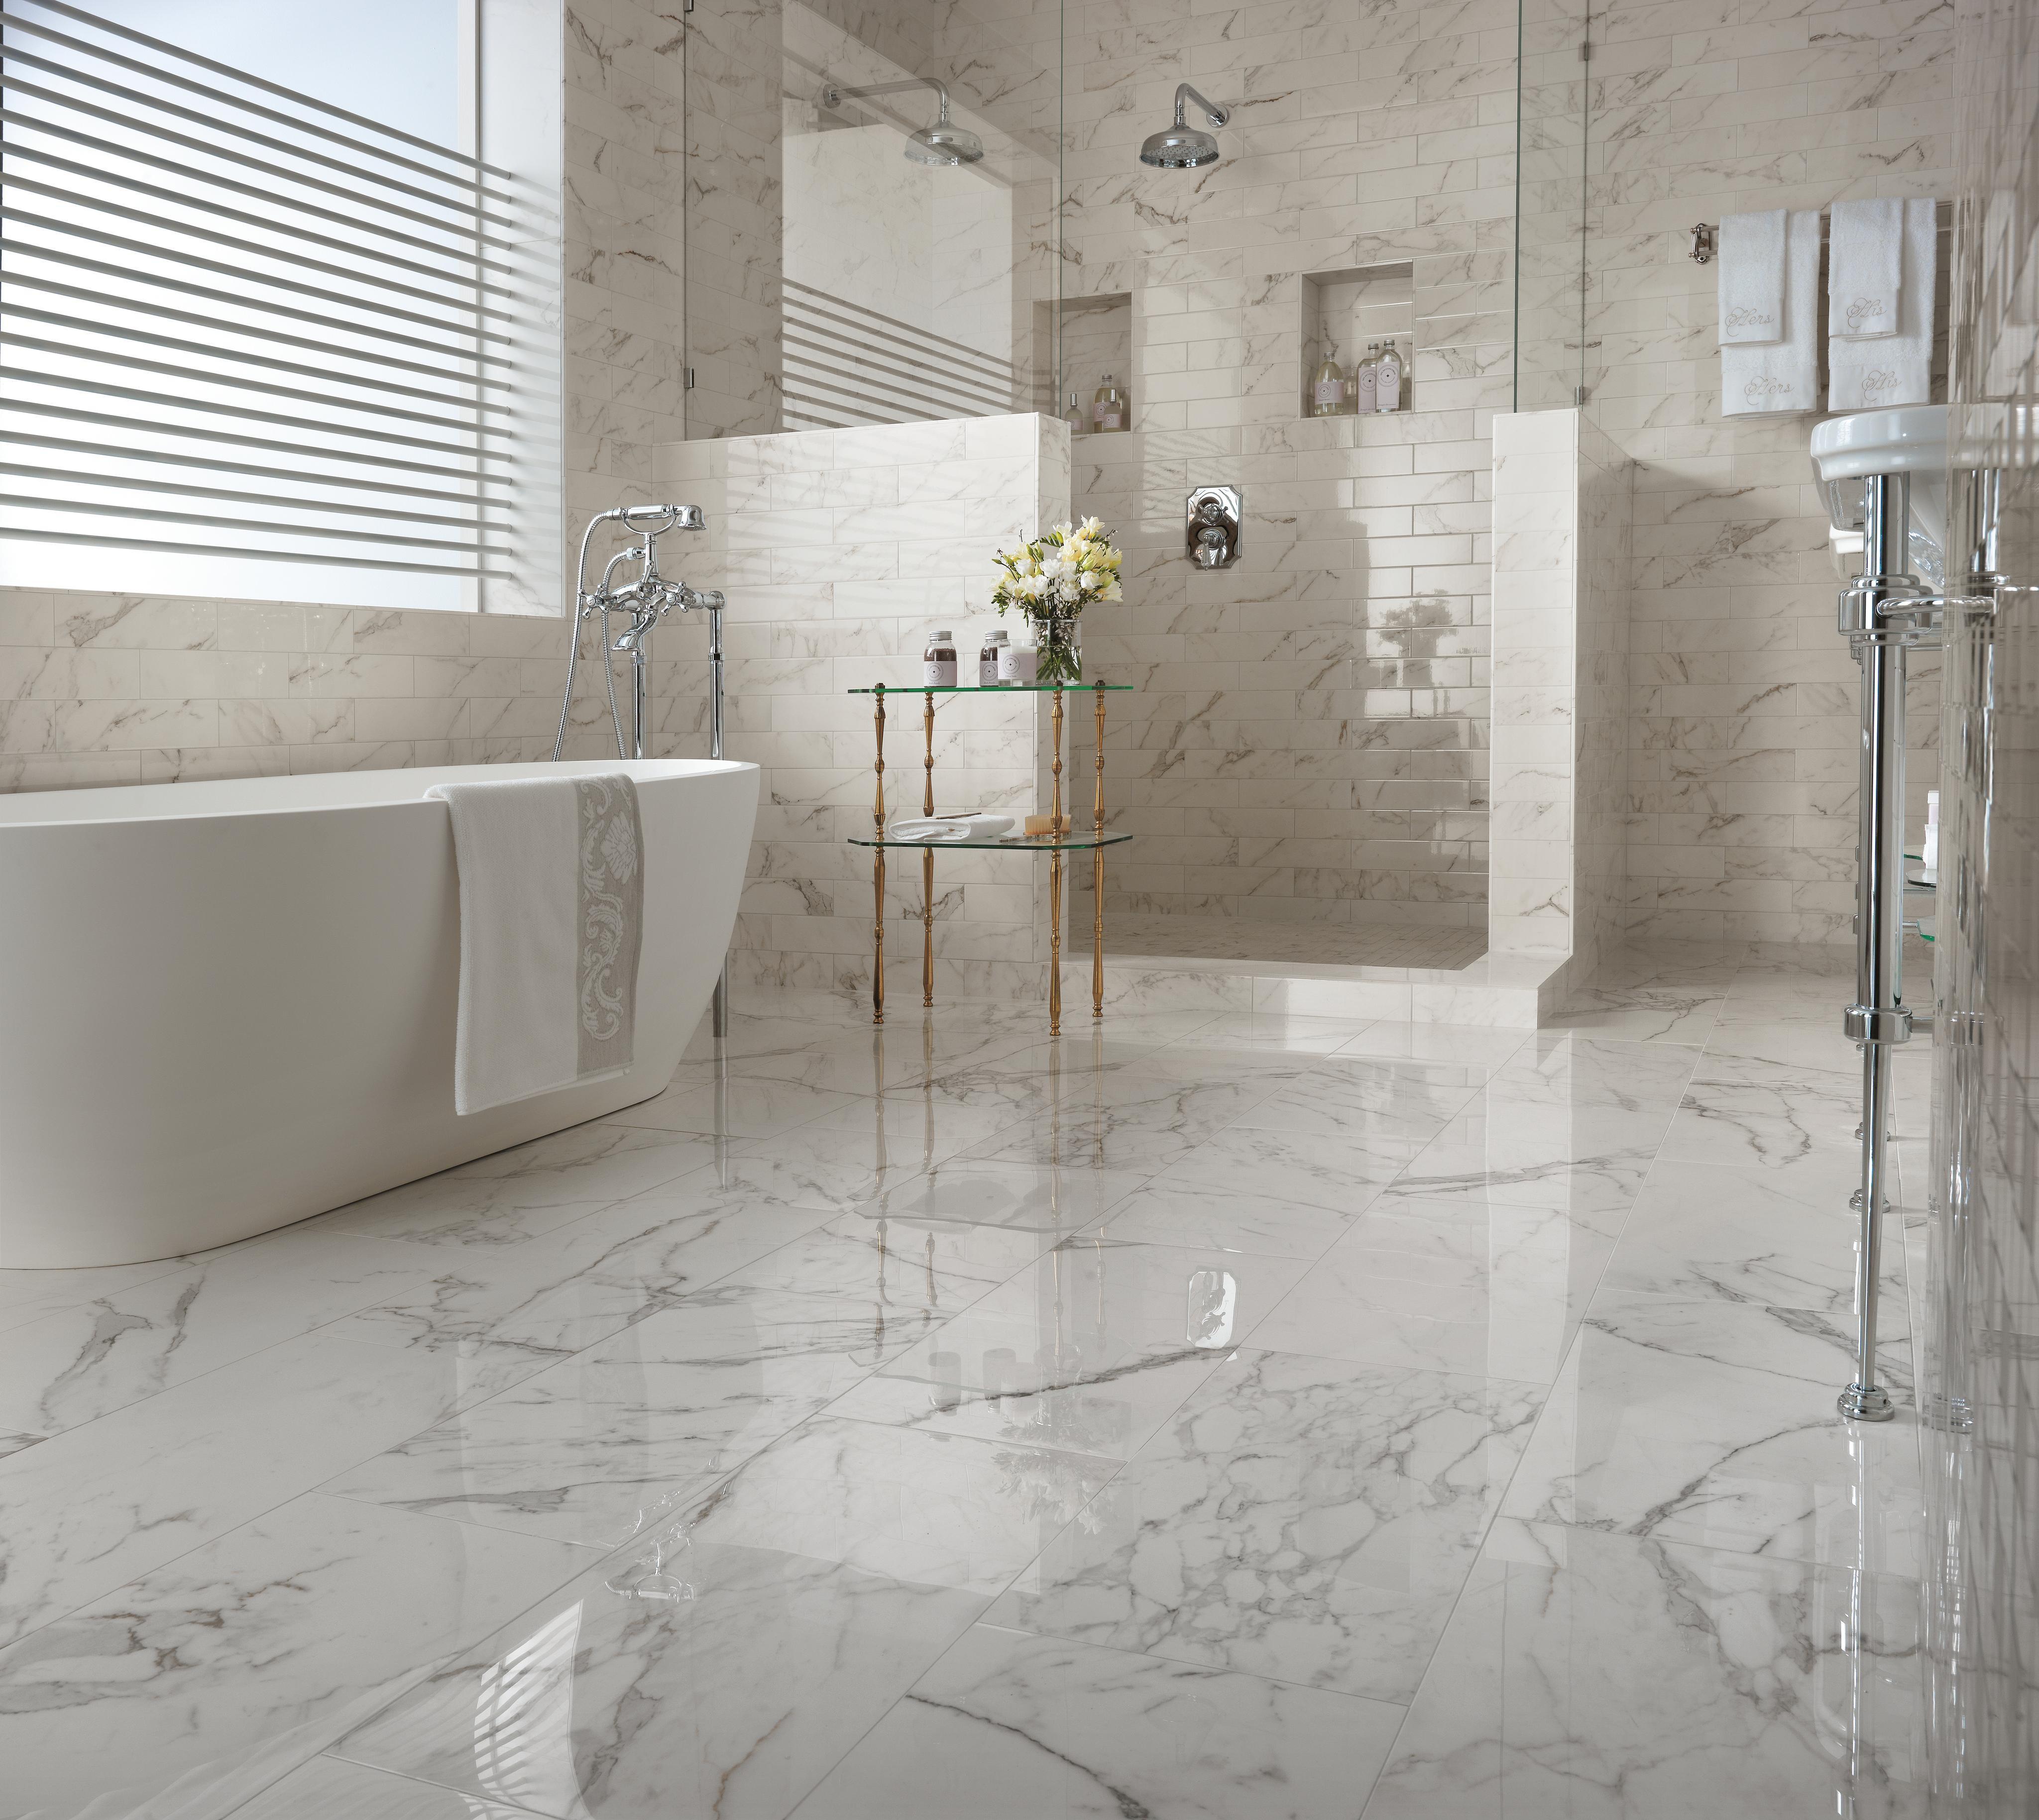 Atlas Marvel Calacatta Extra brick atelier - marble look ceramic tiles - atlas concorde